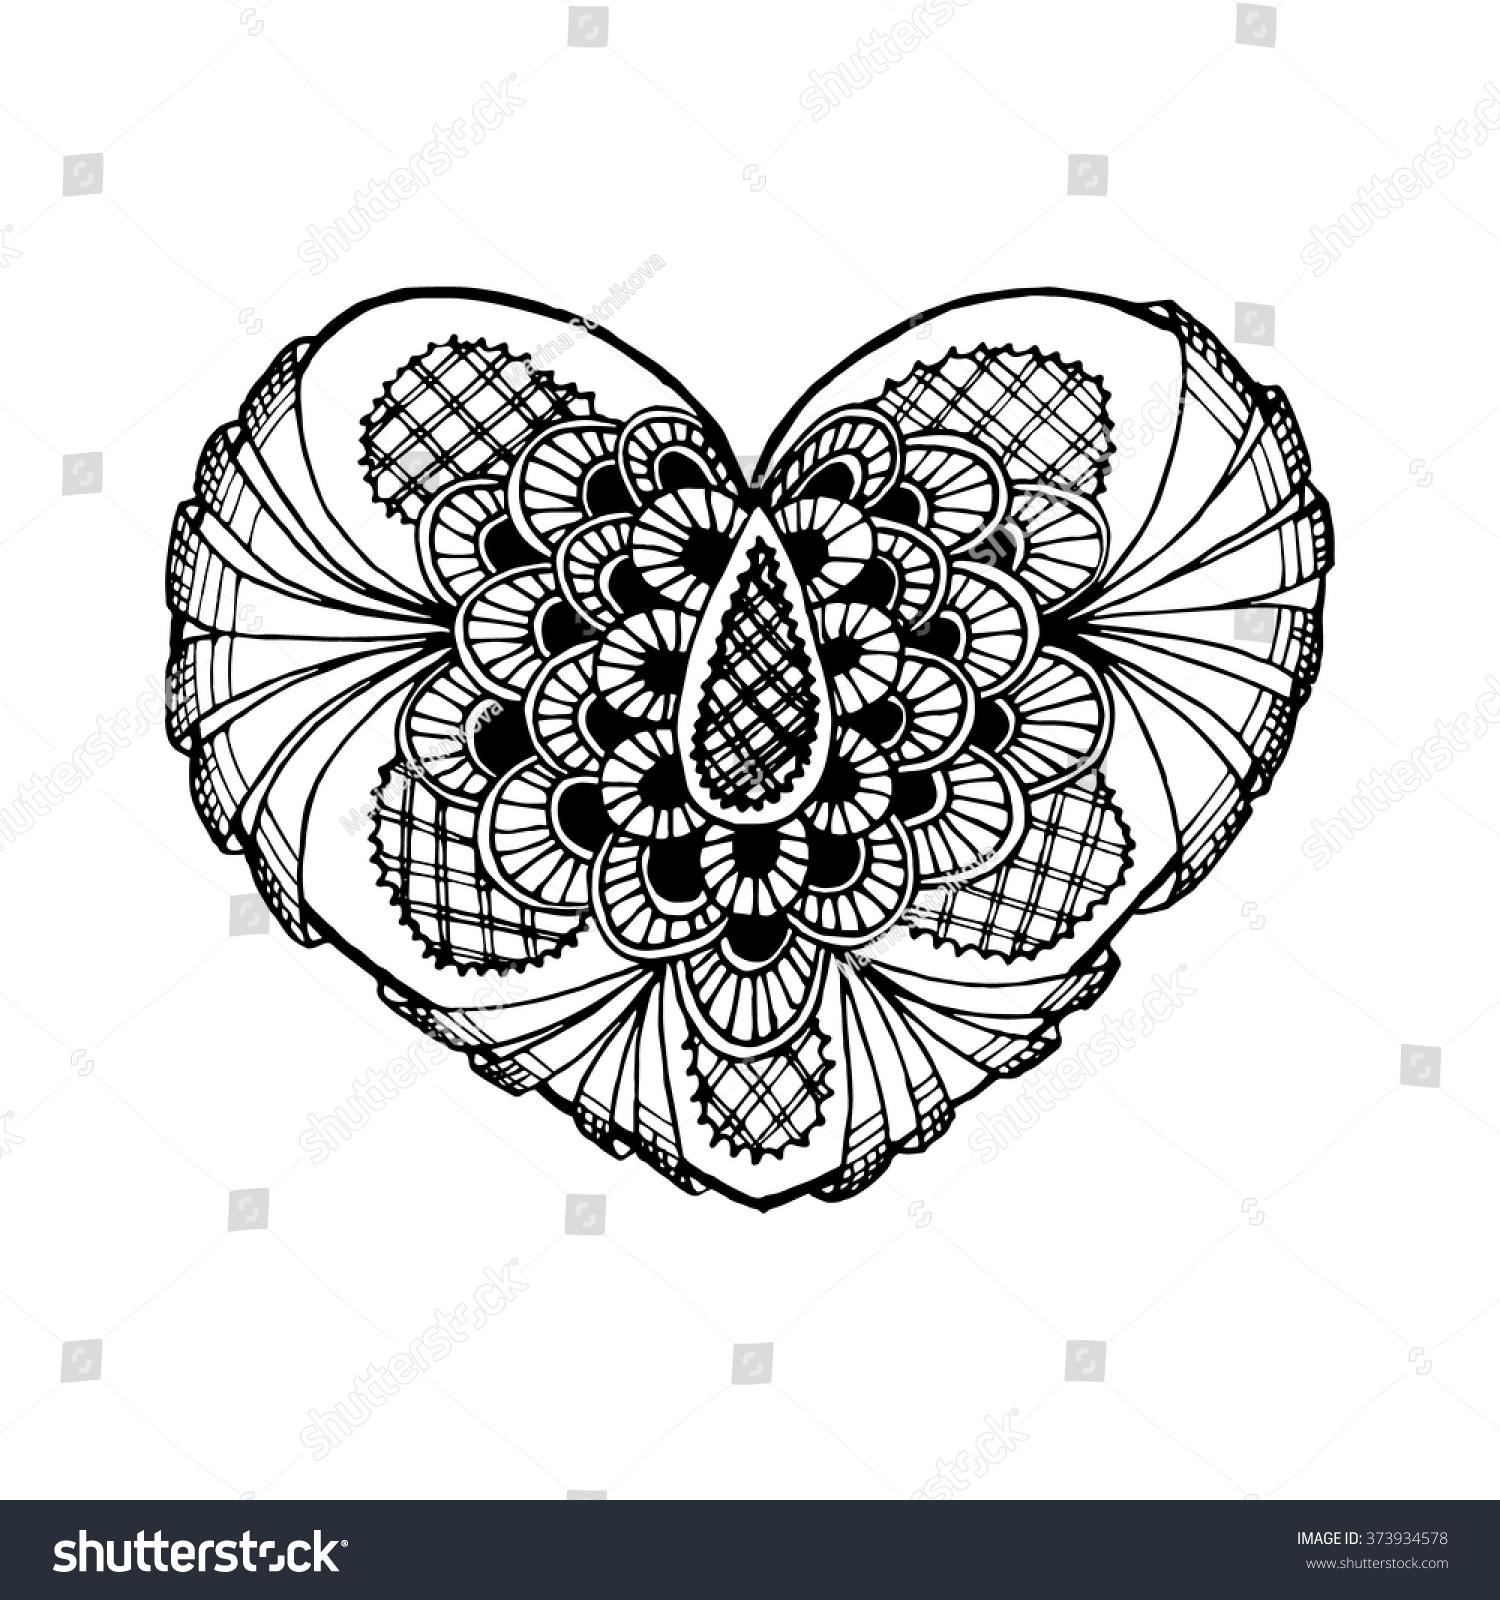 Zentange Heart Black And White Doodle